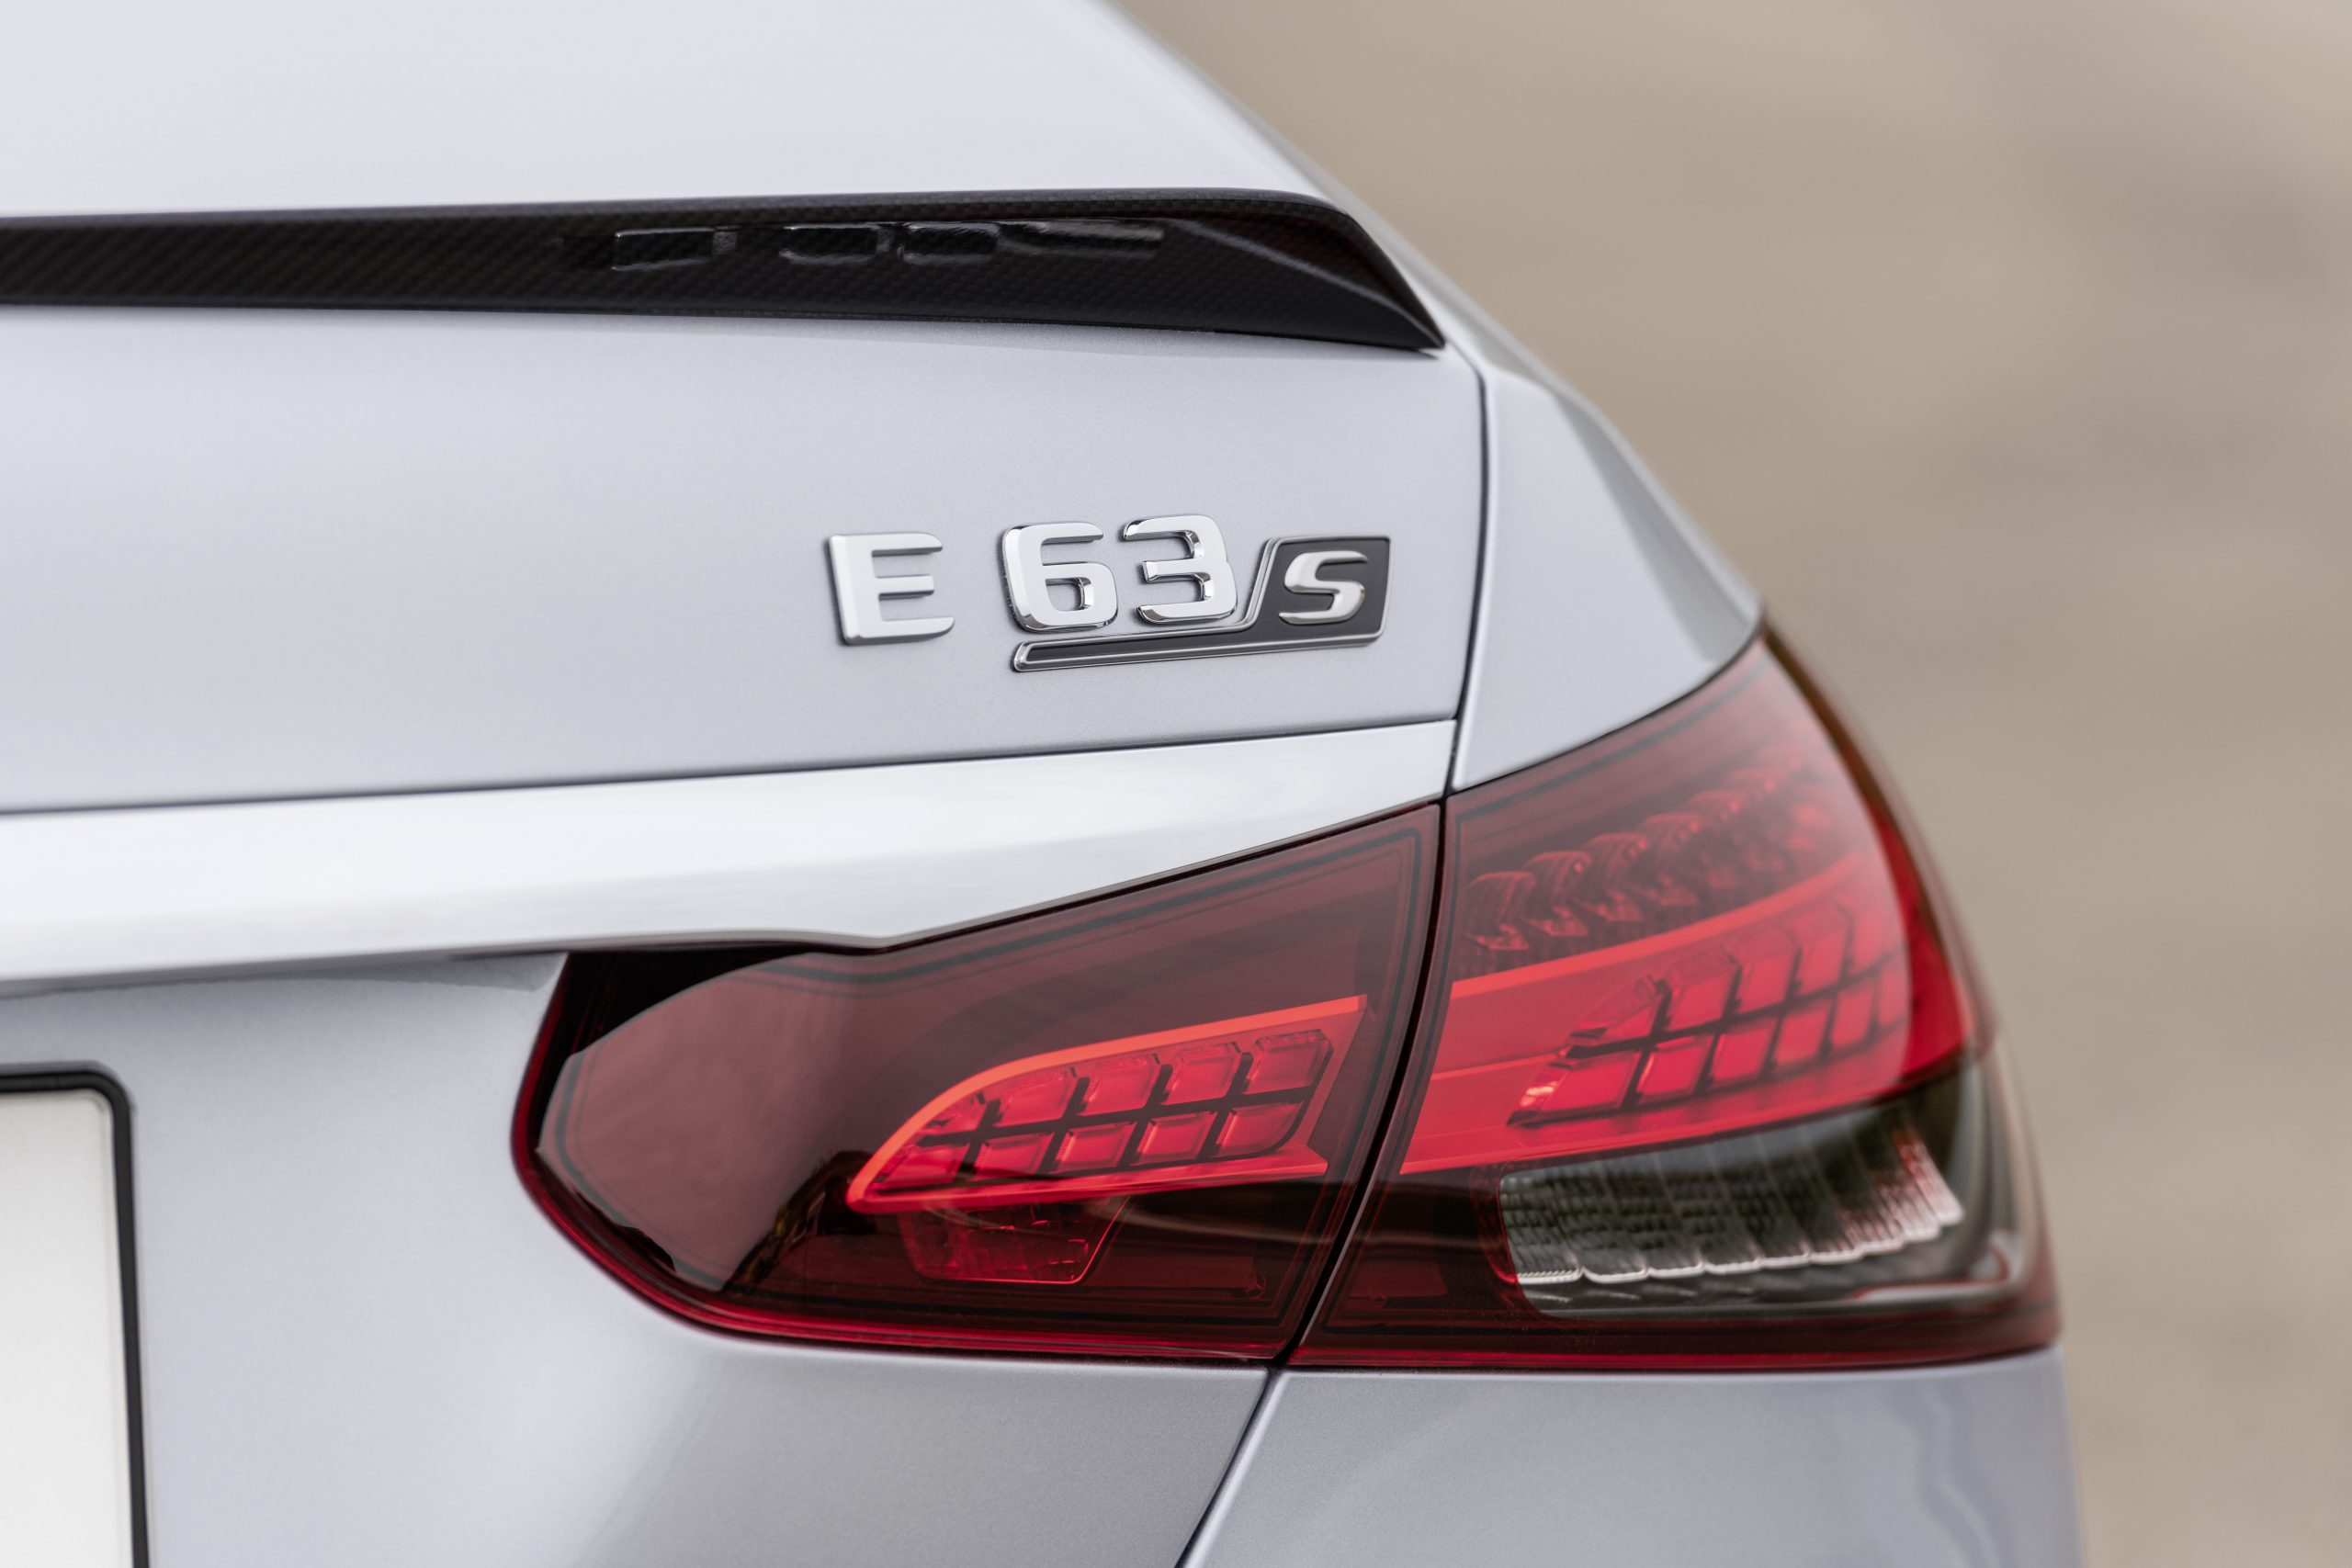 2021 Mercedes-AMG E63 S sedan badge